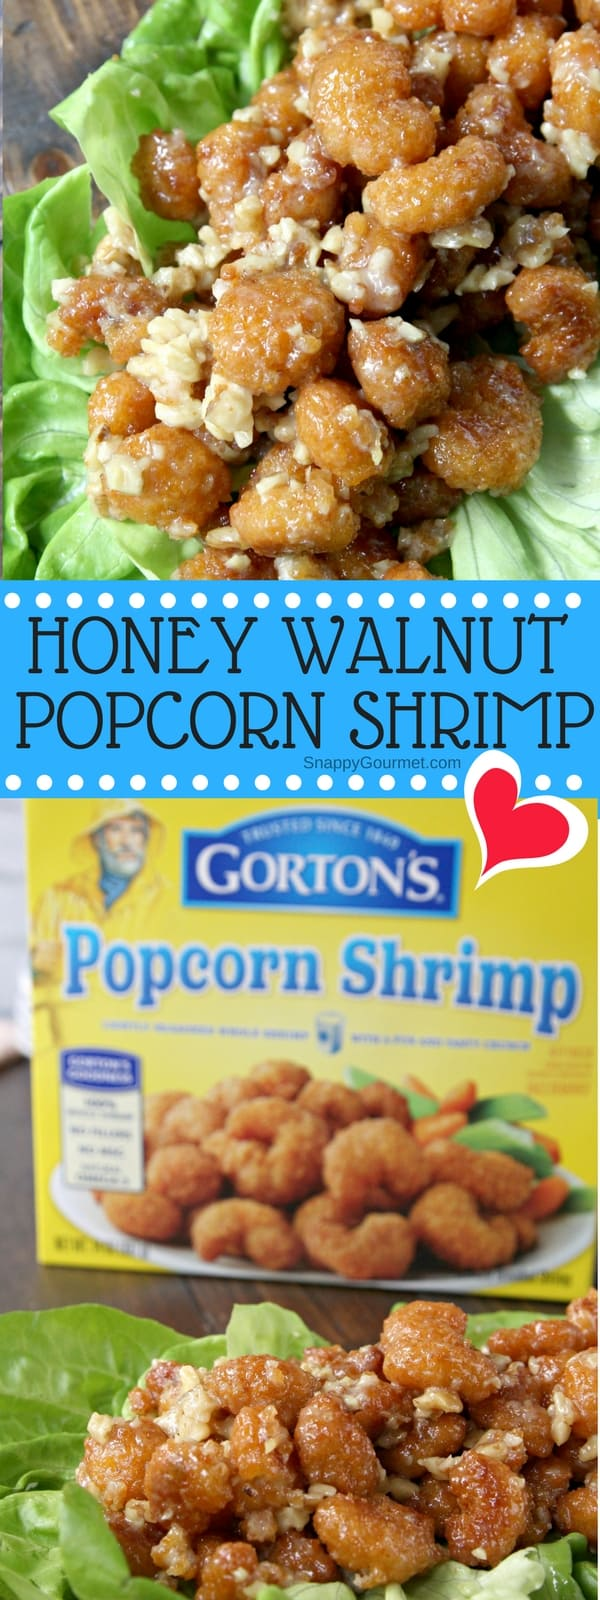 Honey Walnut Popcorn Shrimp - quick and easy honey walnut shrimp with a homemade honey walnut sauce and baked popcorn shrimp. SnappyGourmet.com